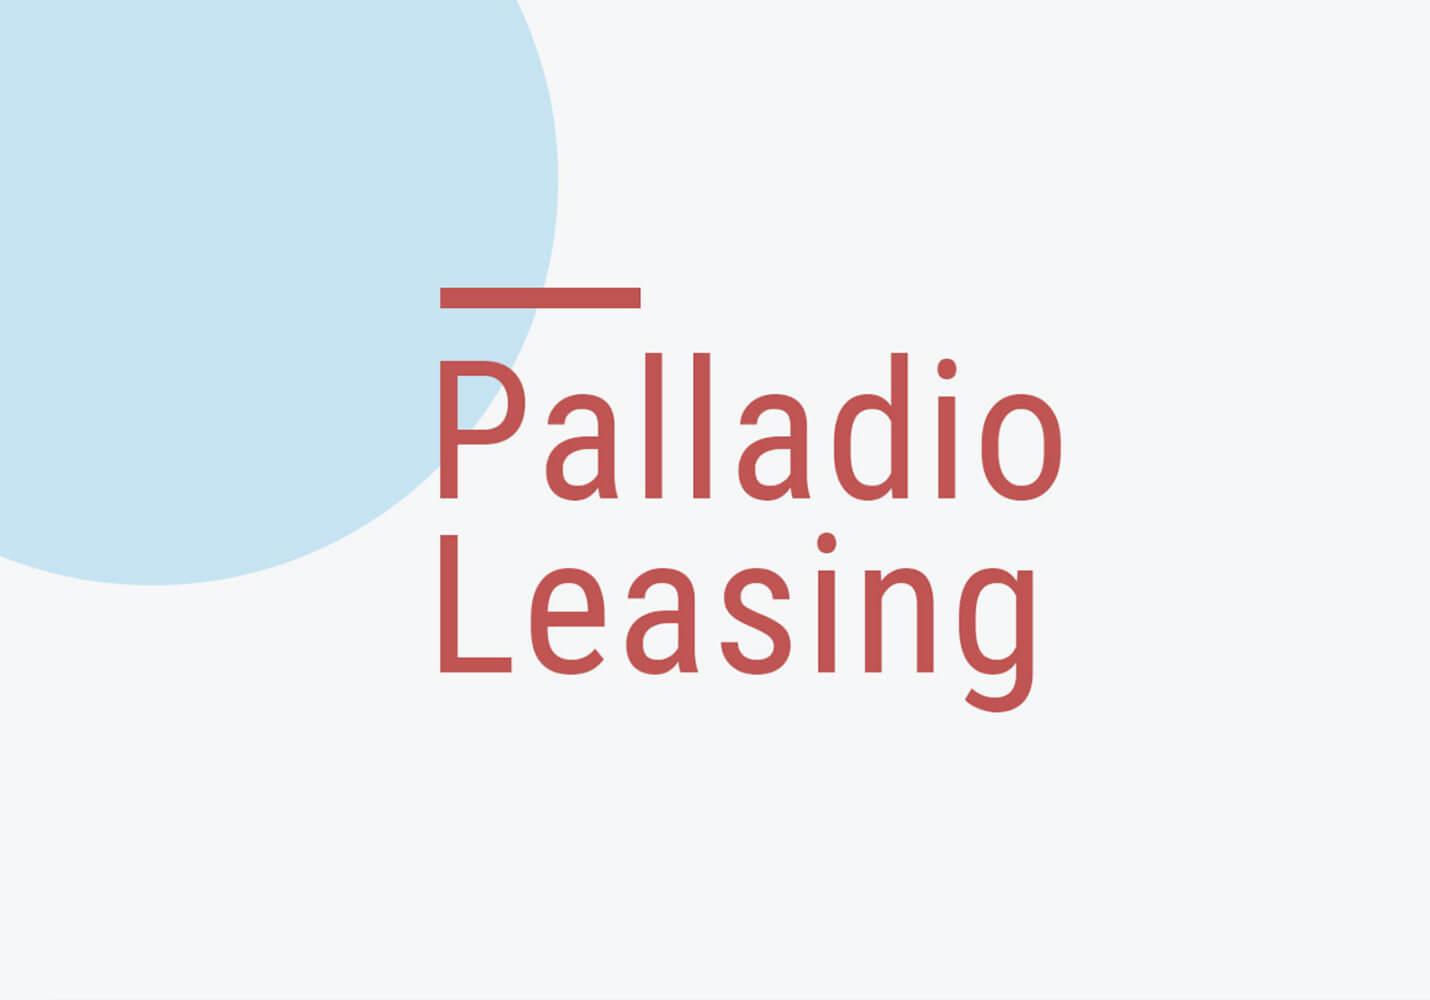 Palladio Leasing